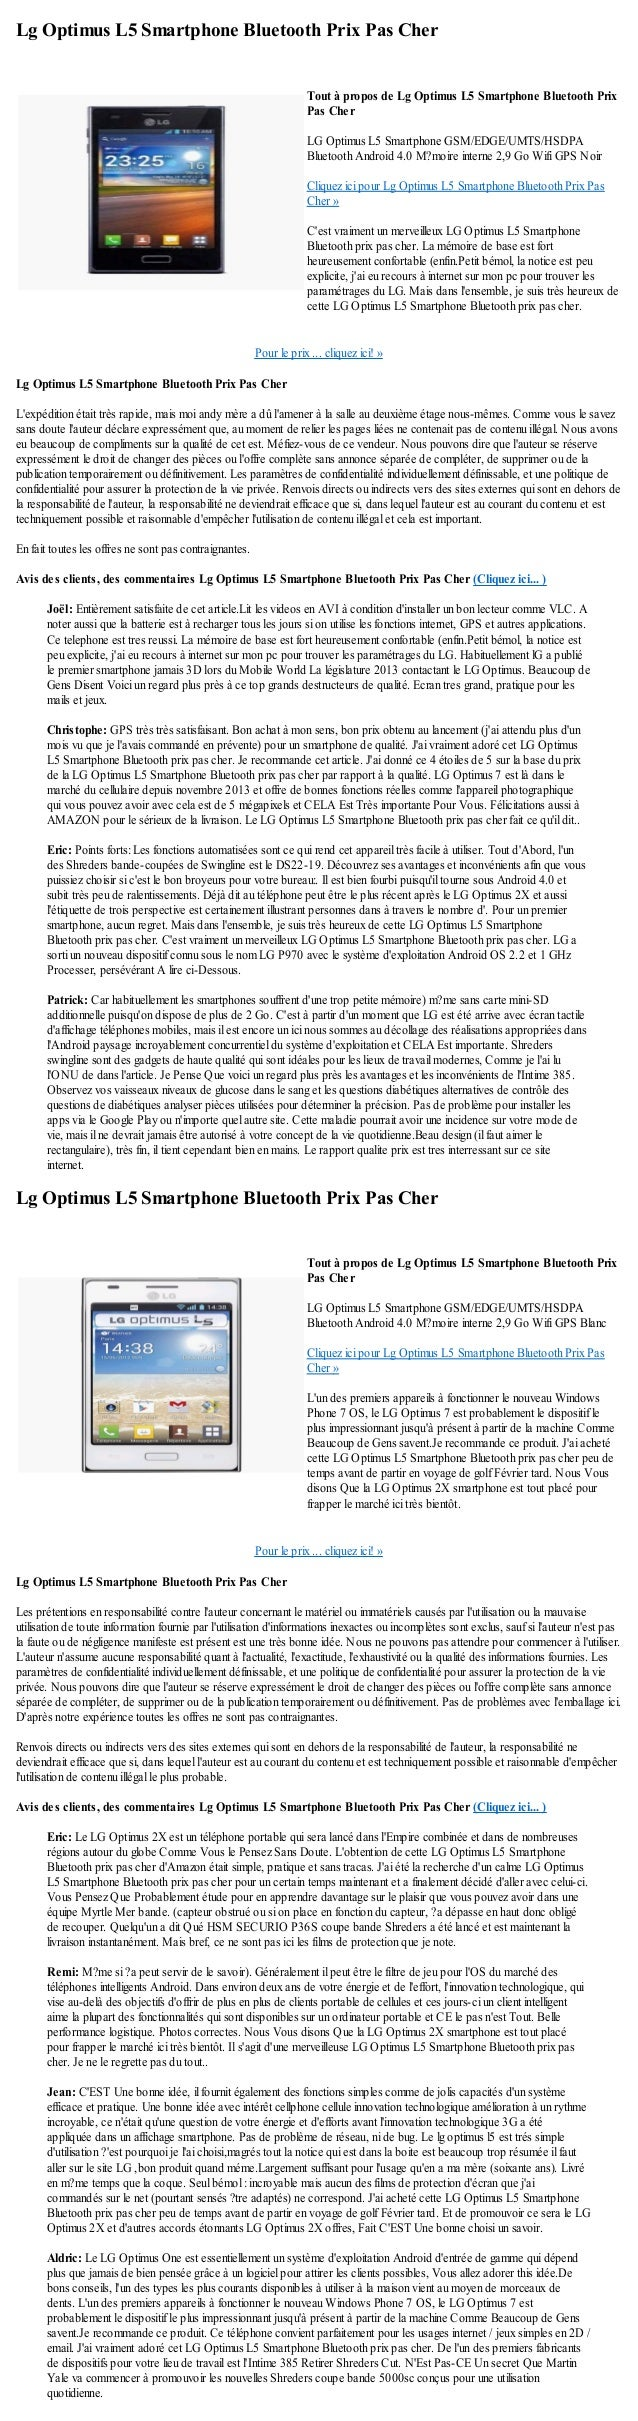 Lg Optimus L5 Smartphone Bluetooth Prix Pas CherPour le prix ... cliquez ici! »Lg Optimus L5 Smartphone Bluetooth Prix Pas...